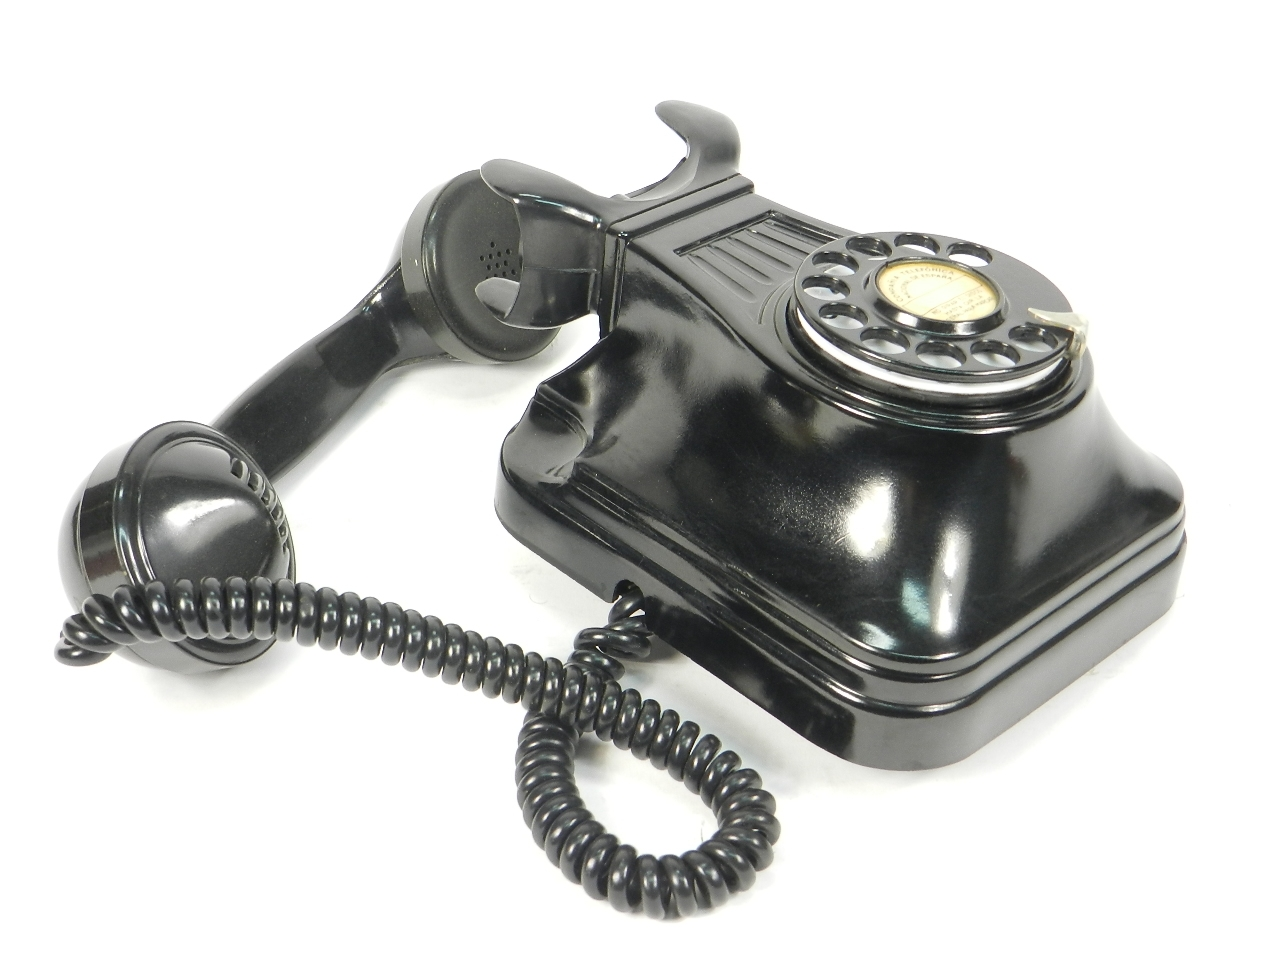 Imagen TELEFONO  STANDARD ELECTRICA  AÑO 1940 41819